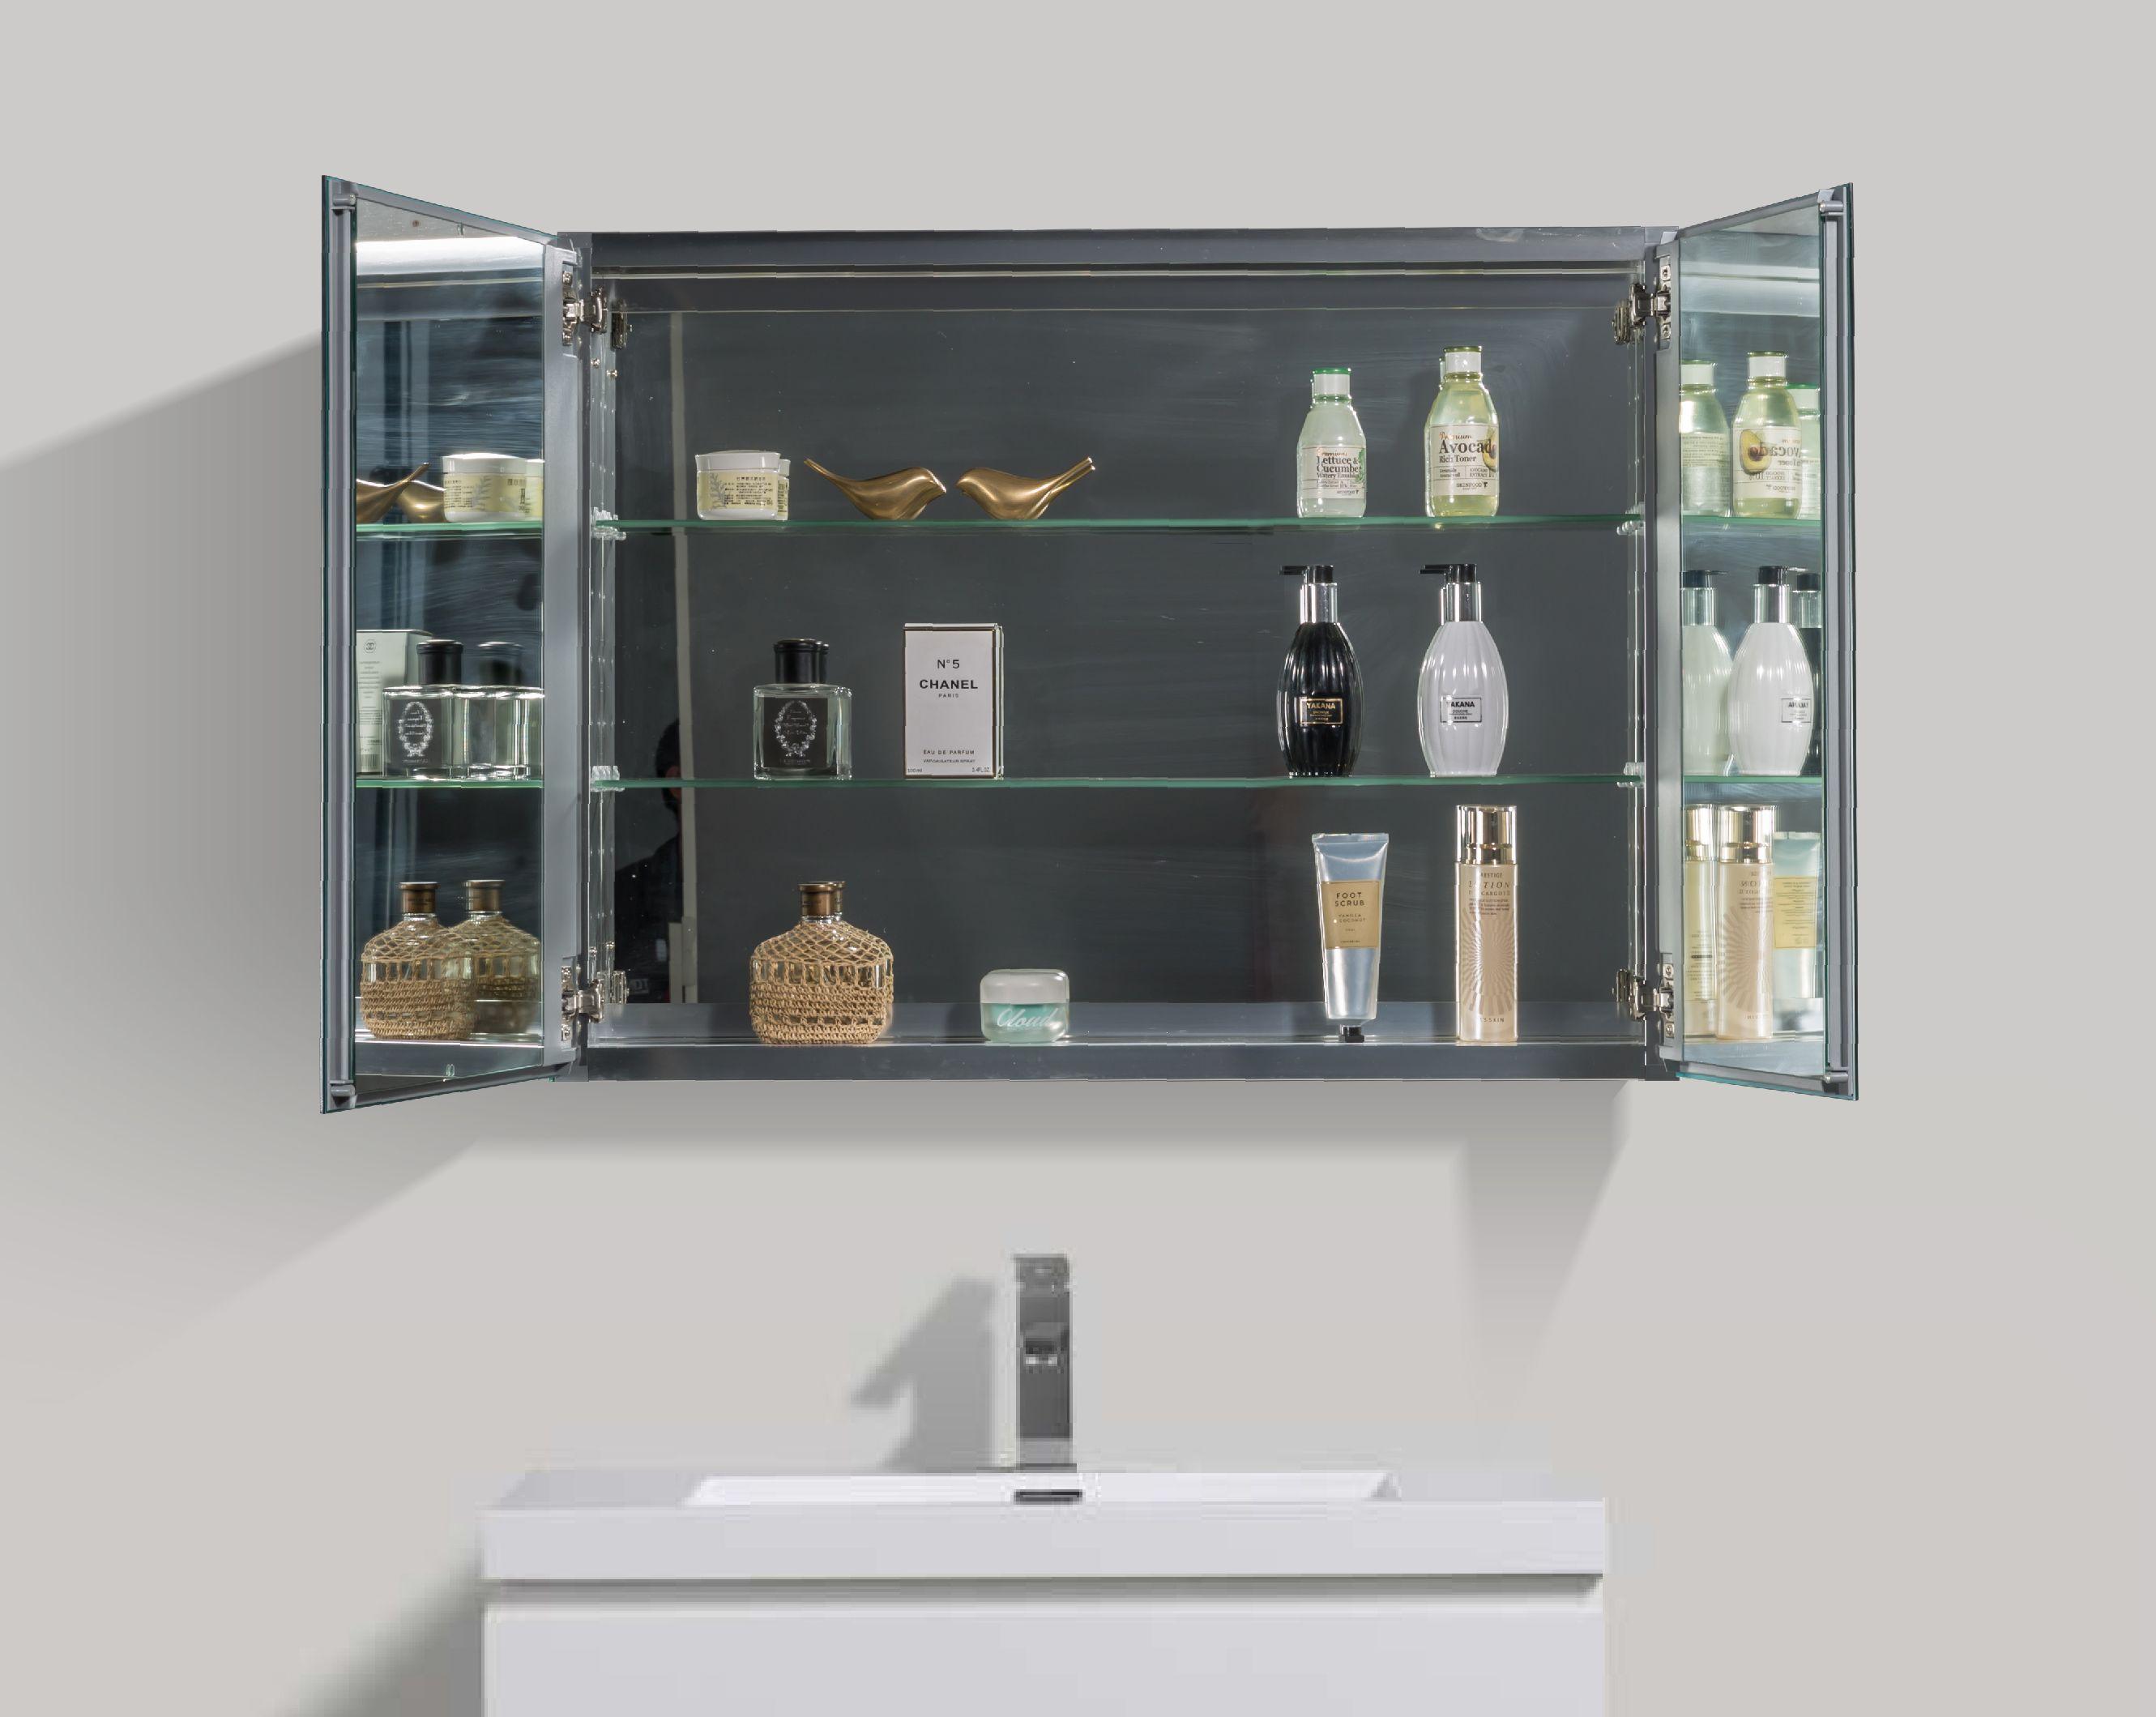 2-türiger LED - Spiegelschrank